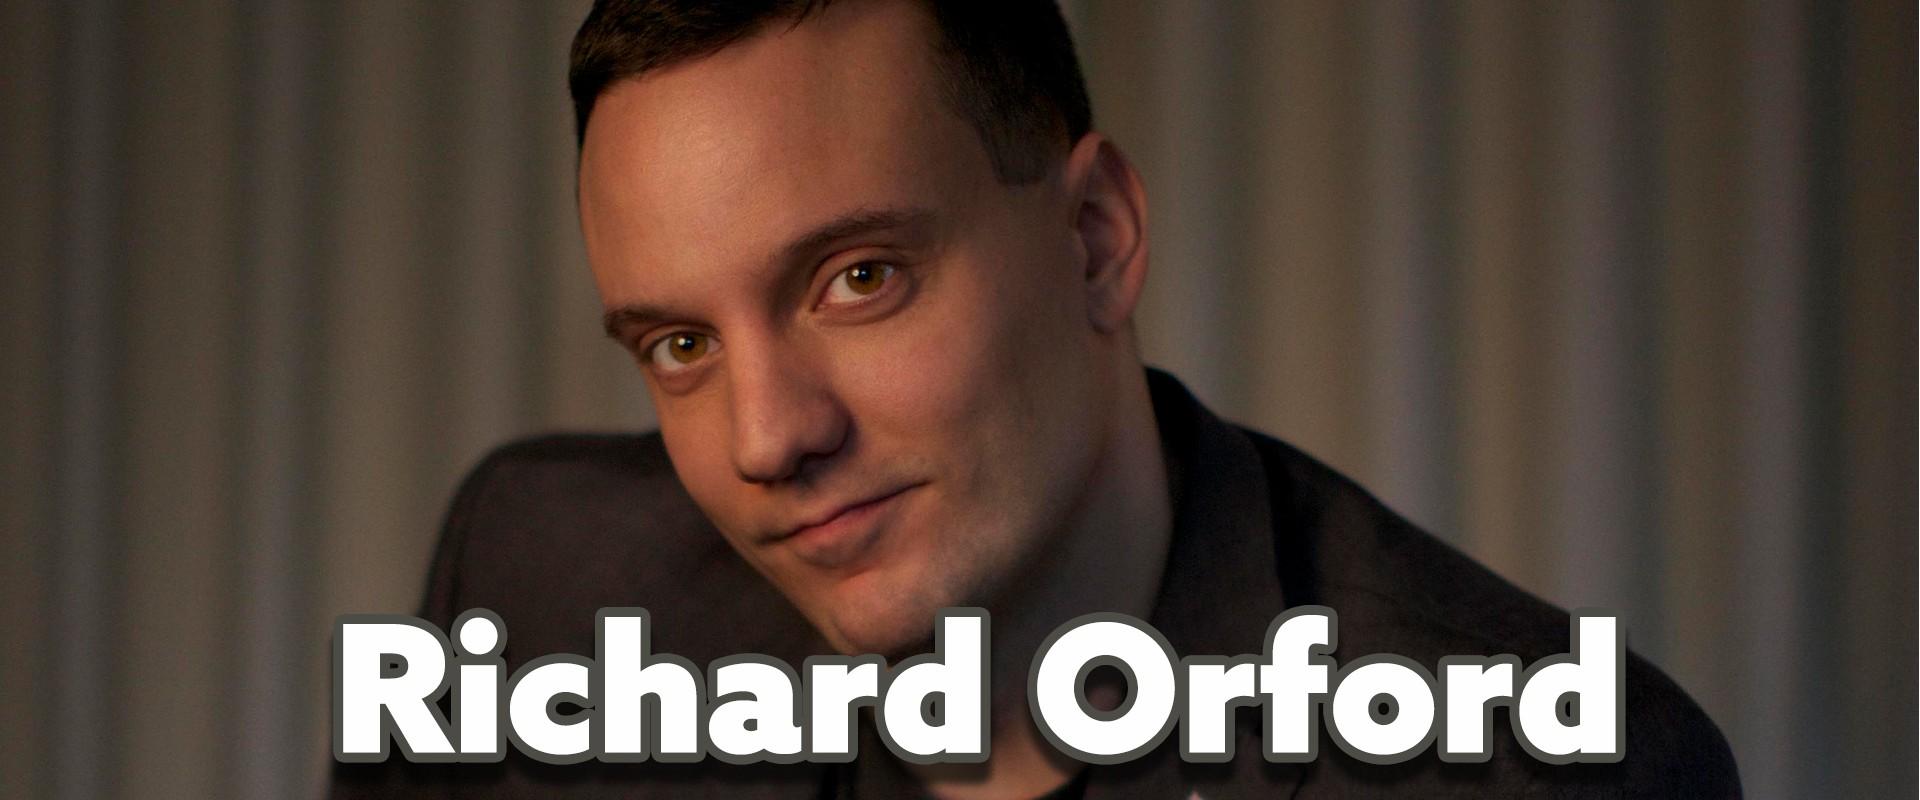 Richard Profile on Craft Store